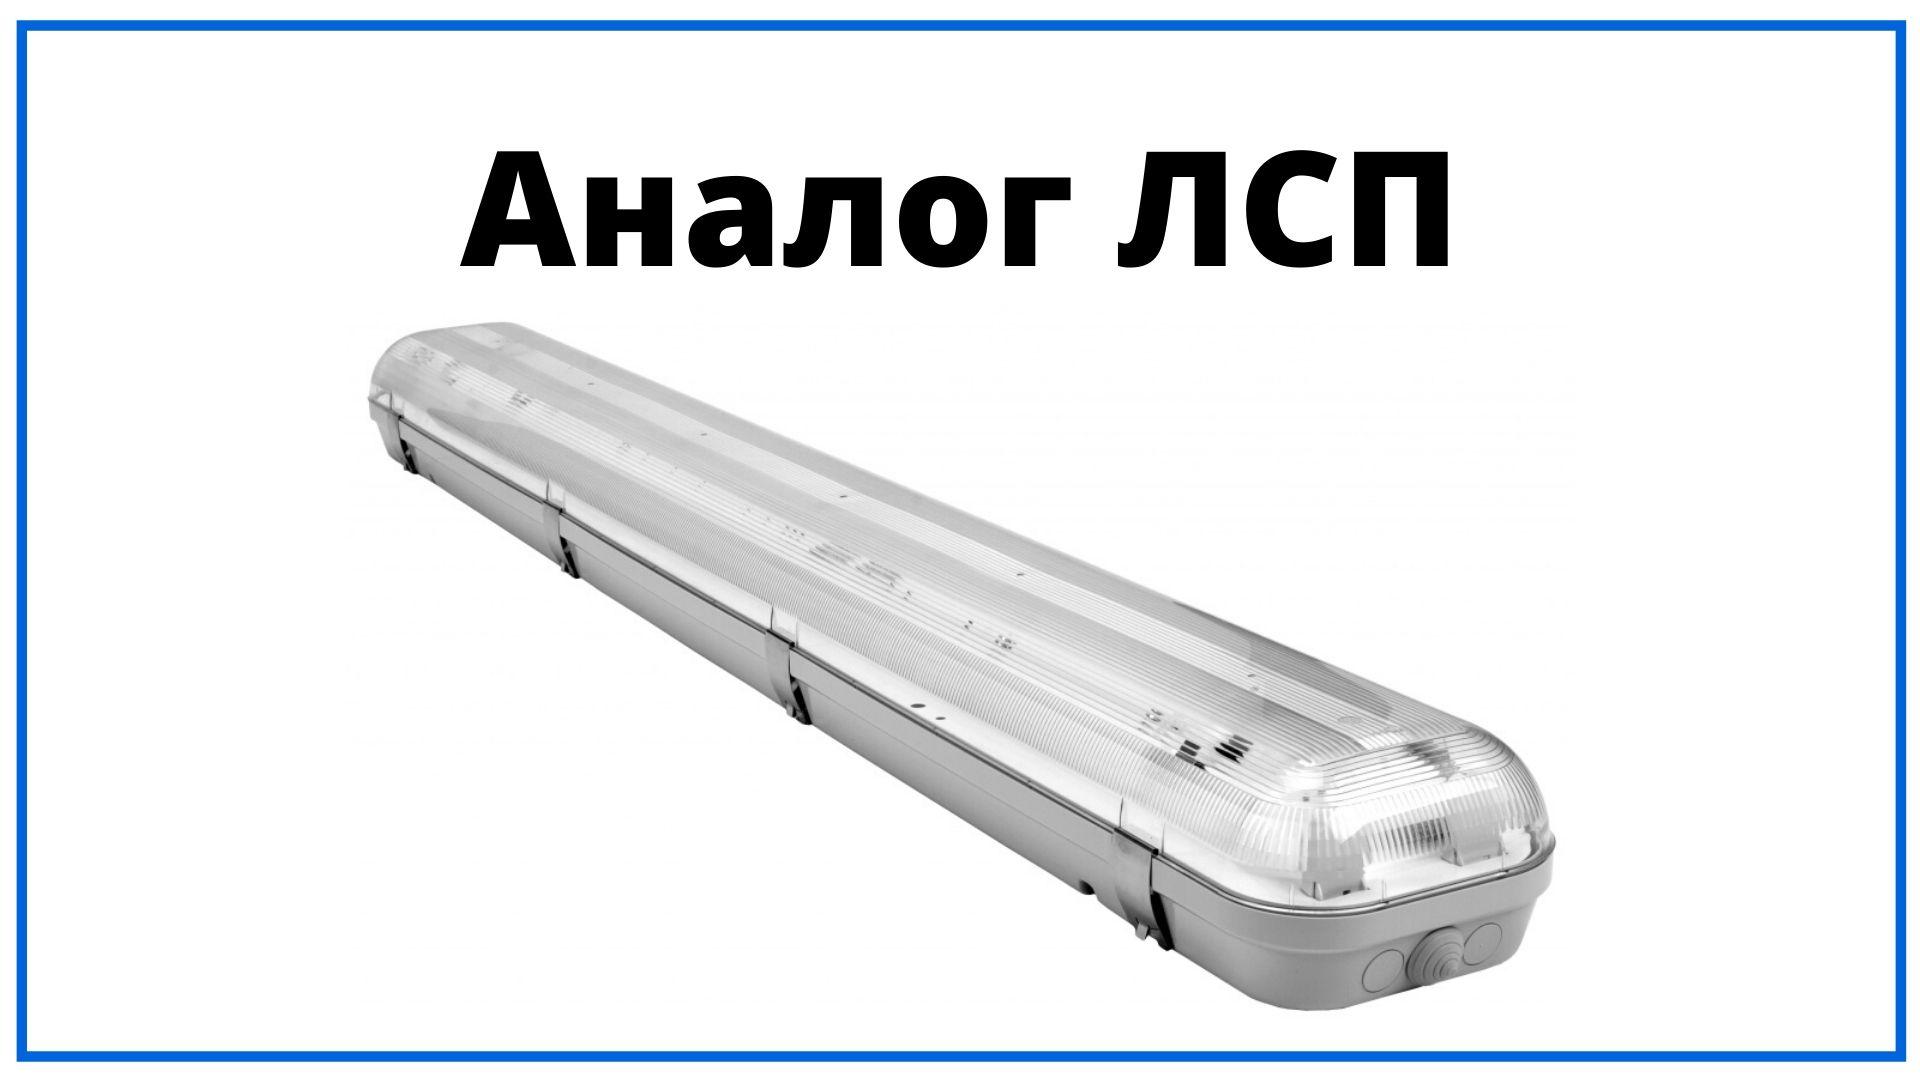 Светильники аналоги ЛСП